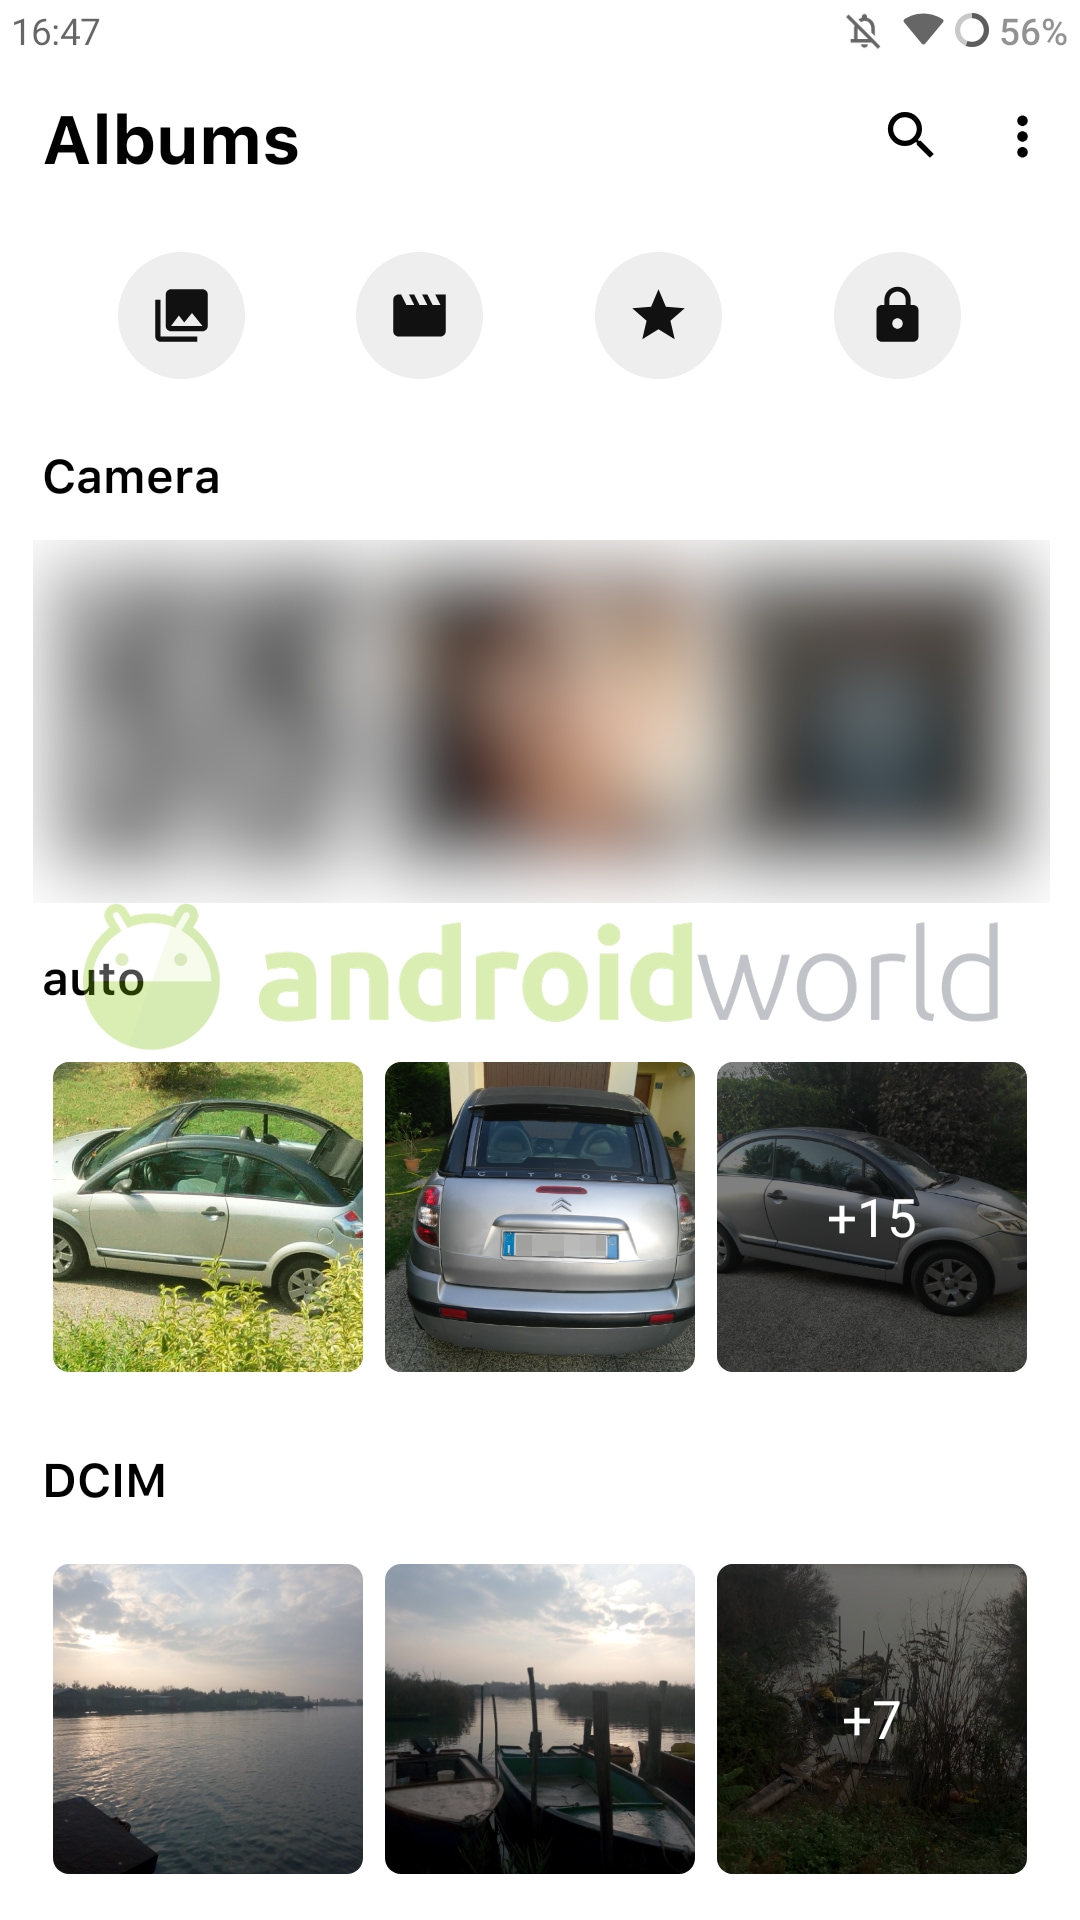 1gallery-app-galleria-criptata-immagini-001